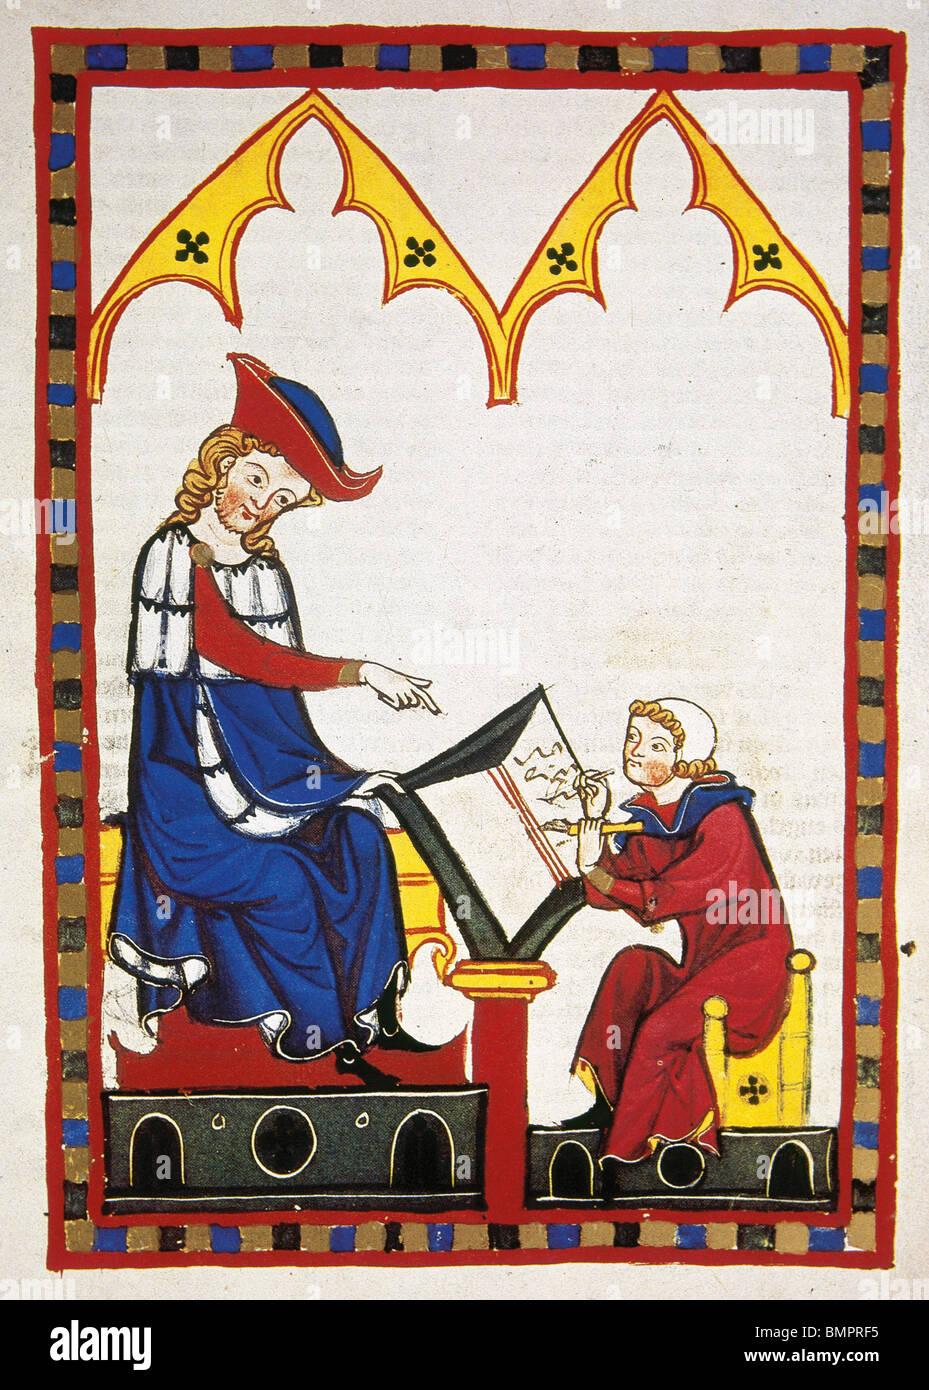 Konrad von Wurzburg. Codex Manesse. - Stock Image